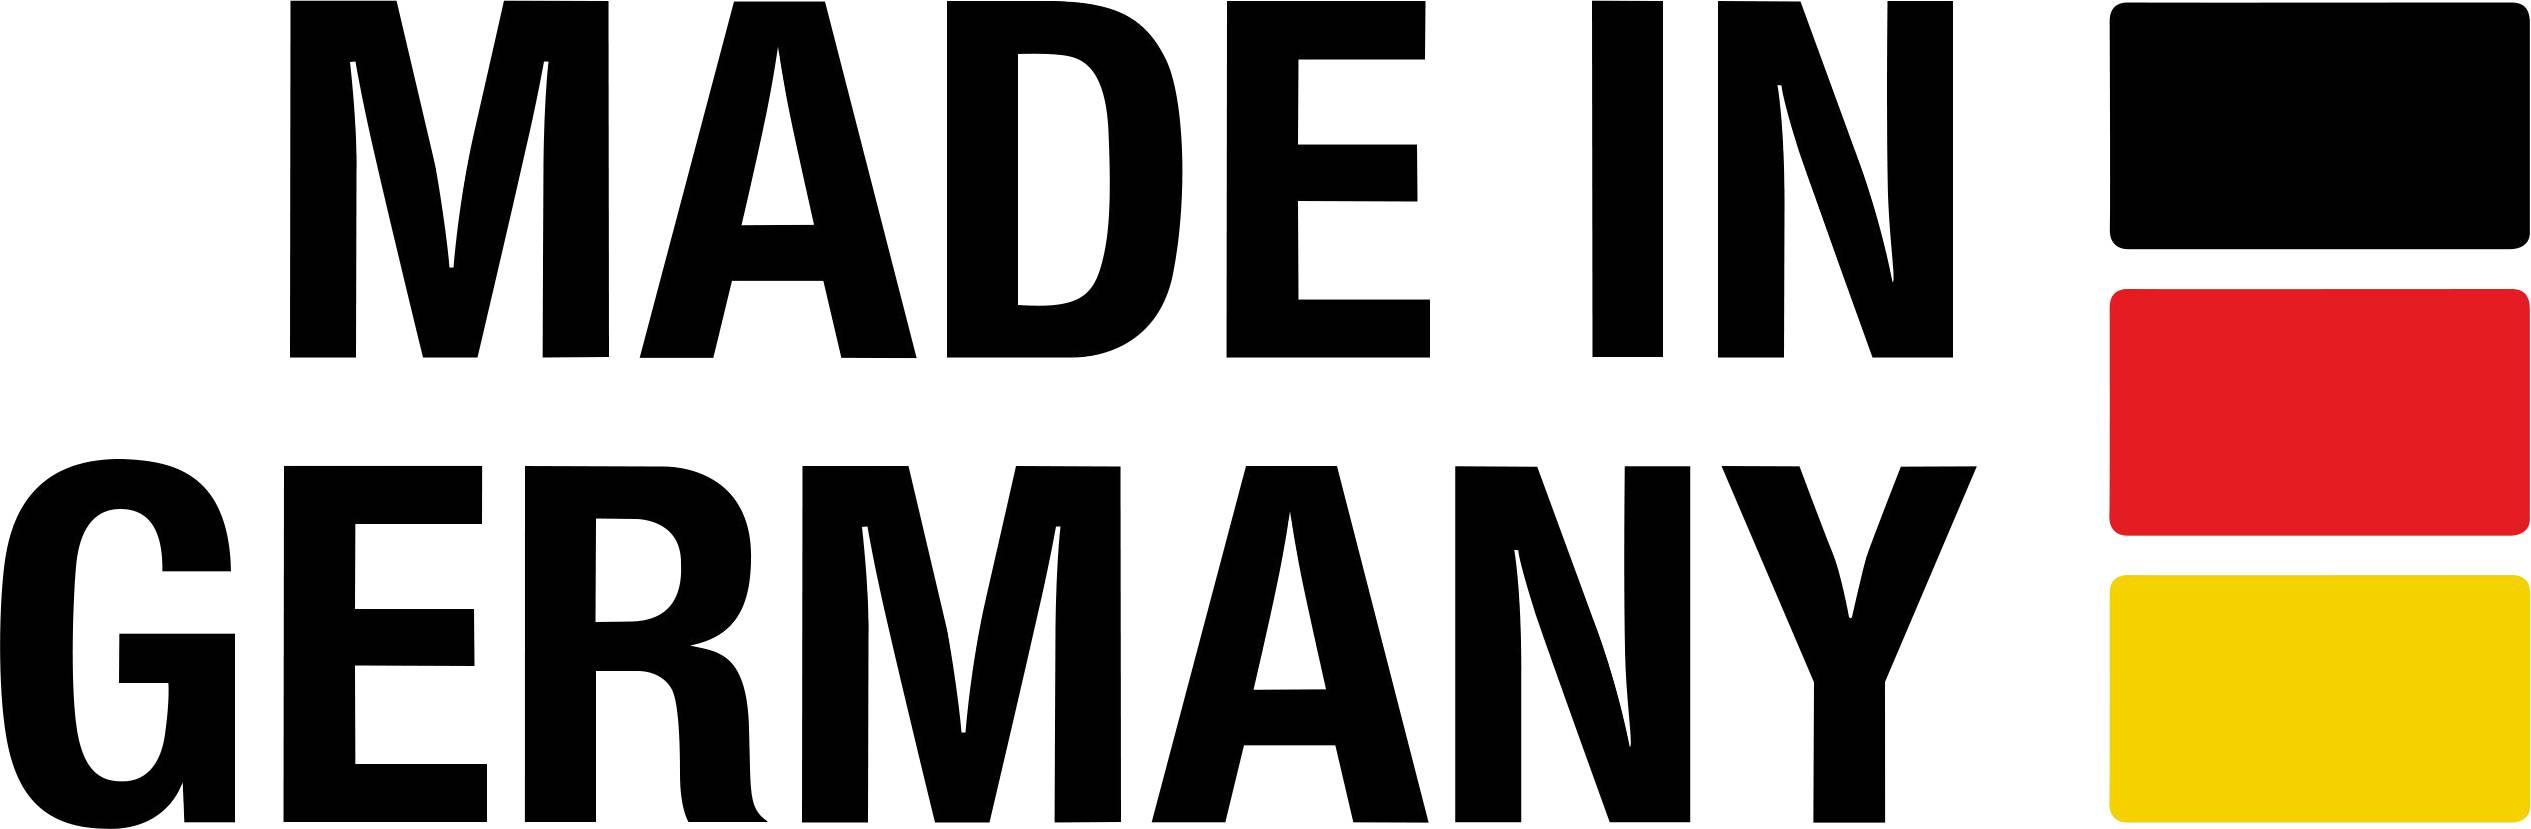 Tesniaci krúžok Wiska EADR 16, M16, etylenpropylendienový kaučuk, 1 ks